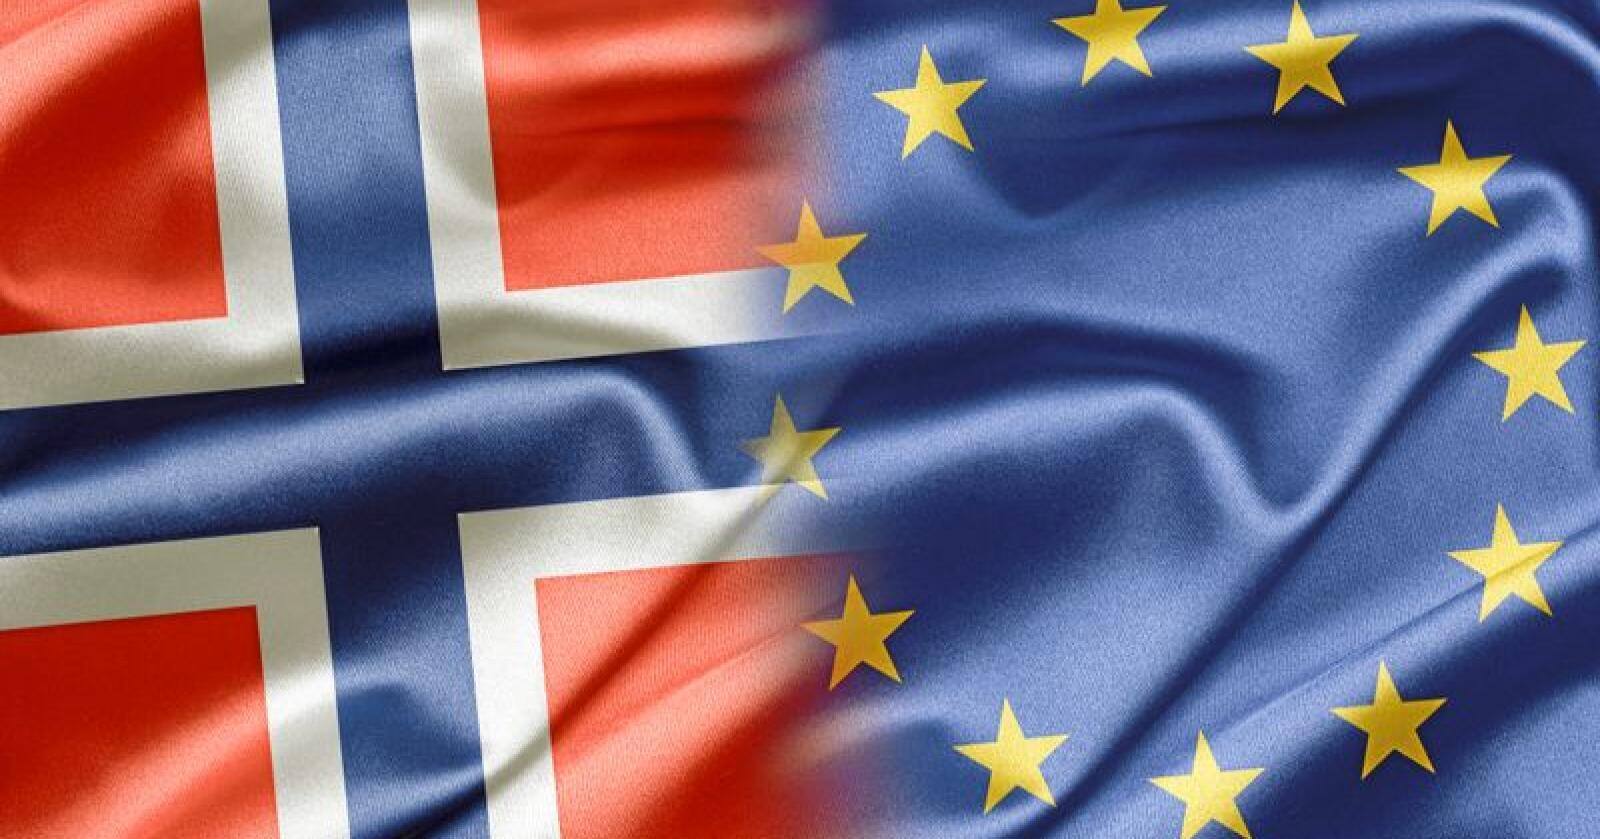 Norway and EU Foto: Ruskpp Ruskpp/Mostphotos